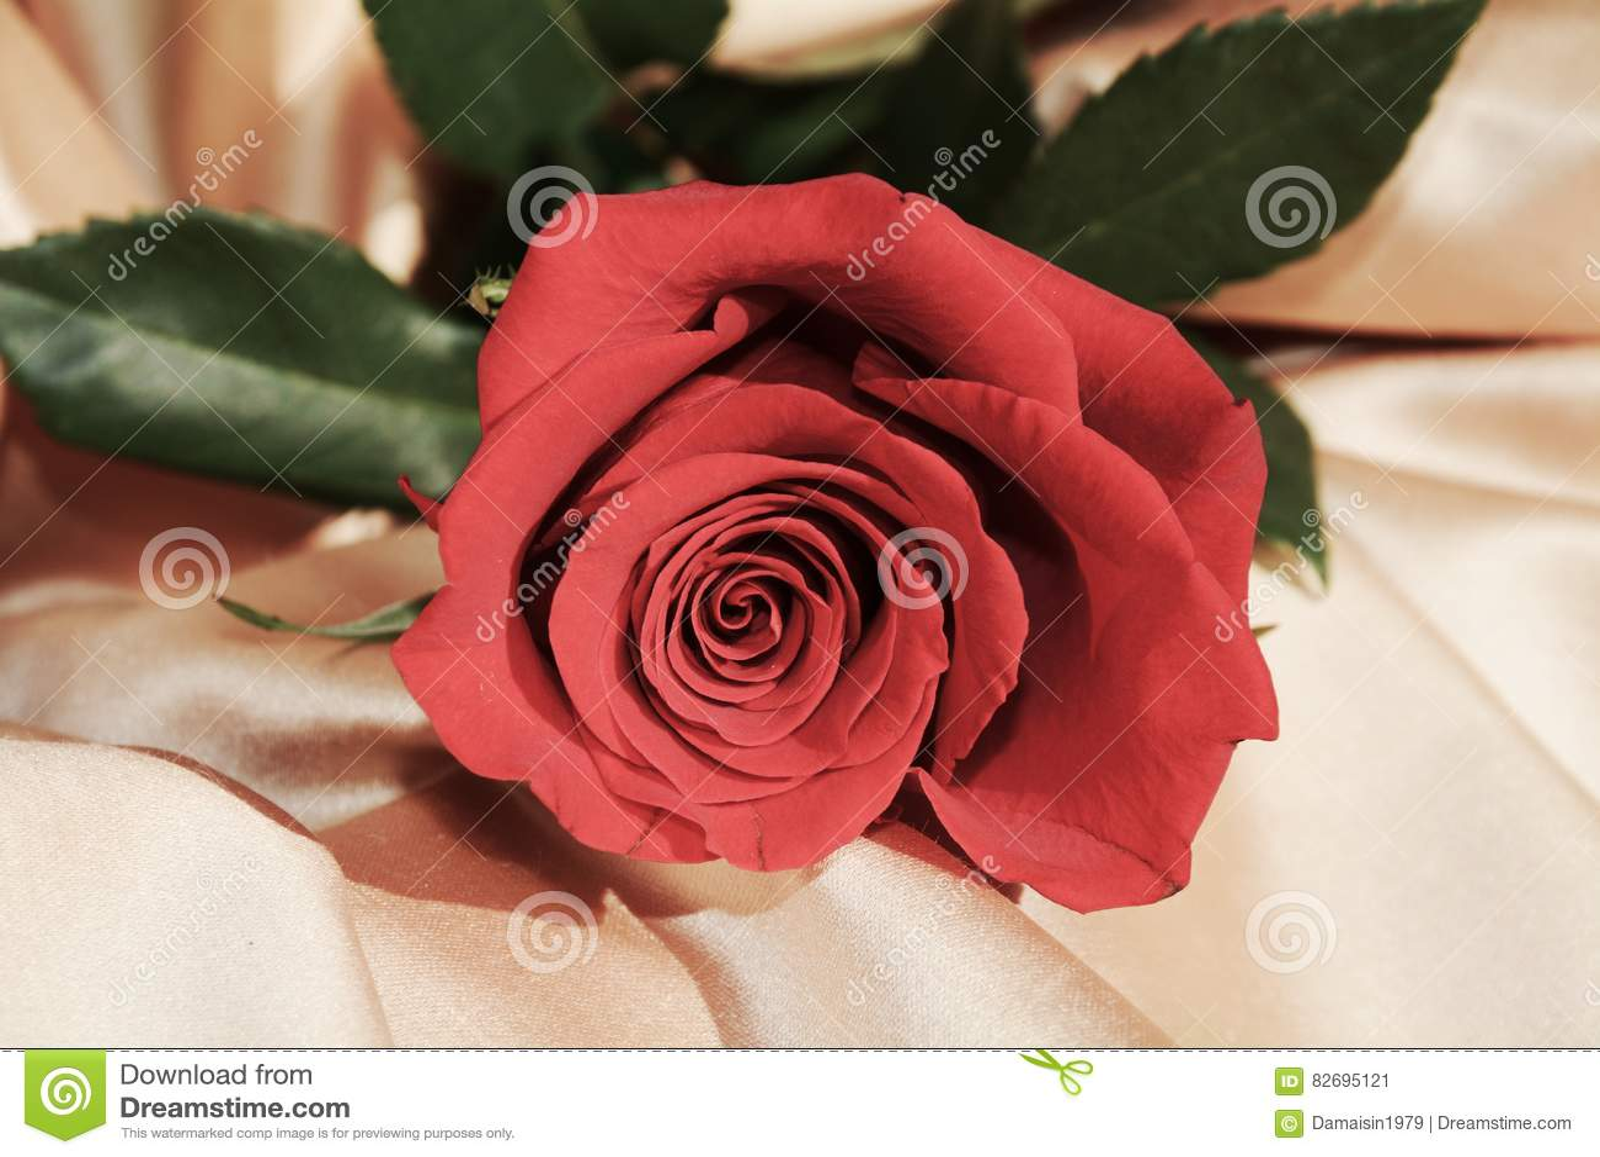 Red Rose Symbol Of Appreciation Stock Image Image Of Appreciation